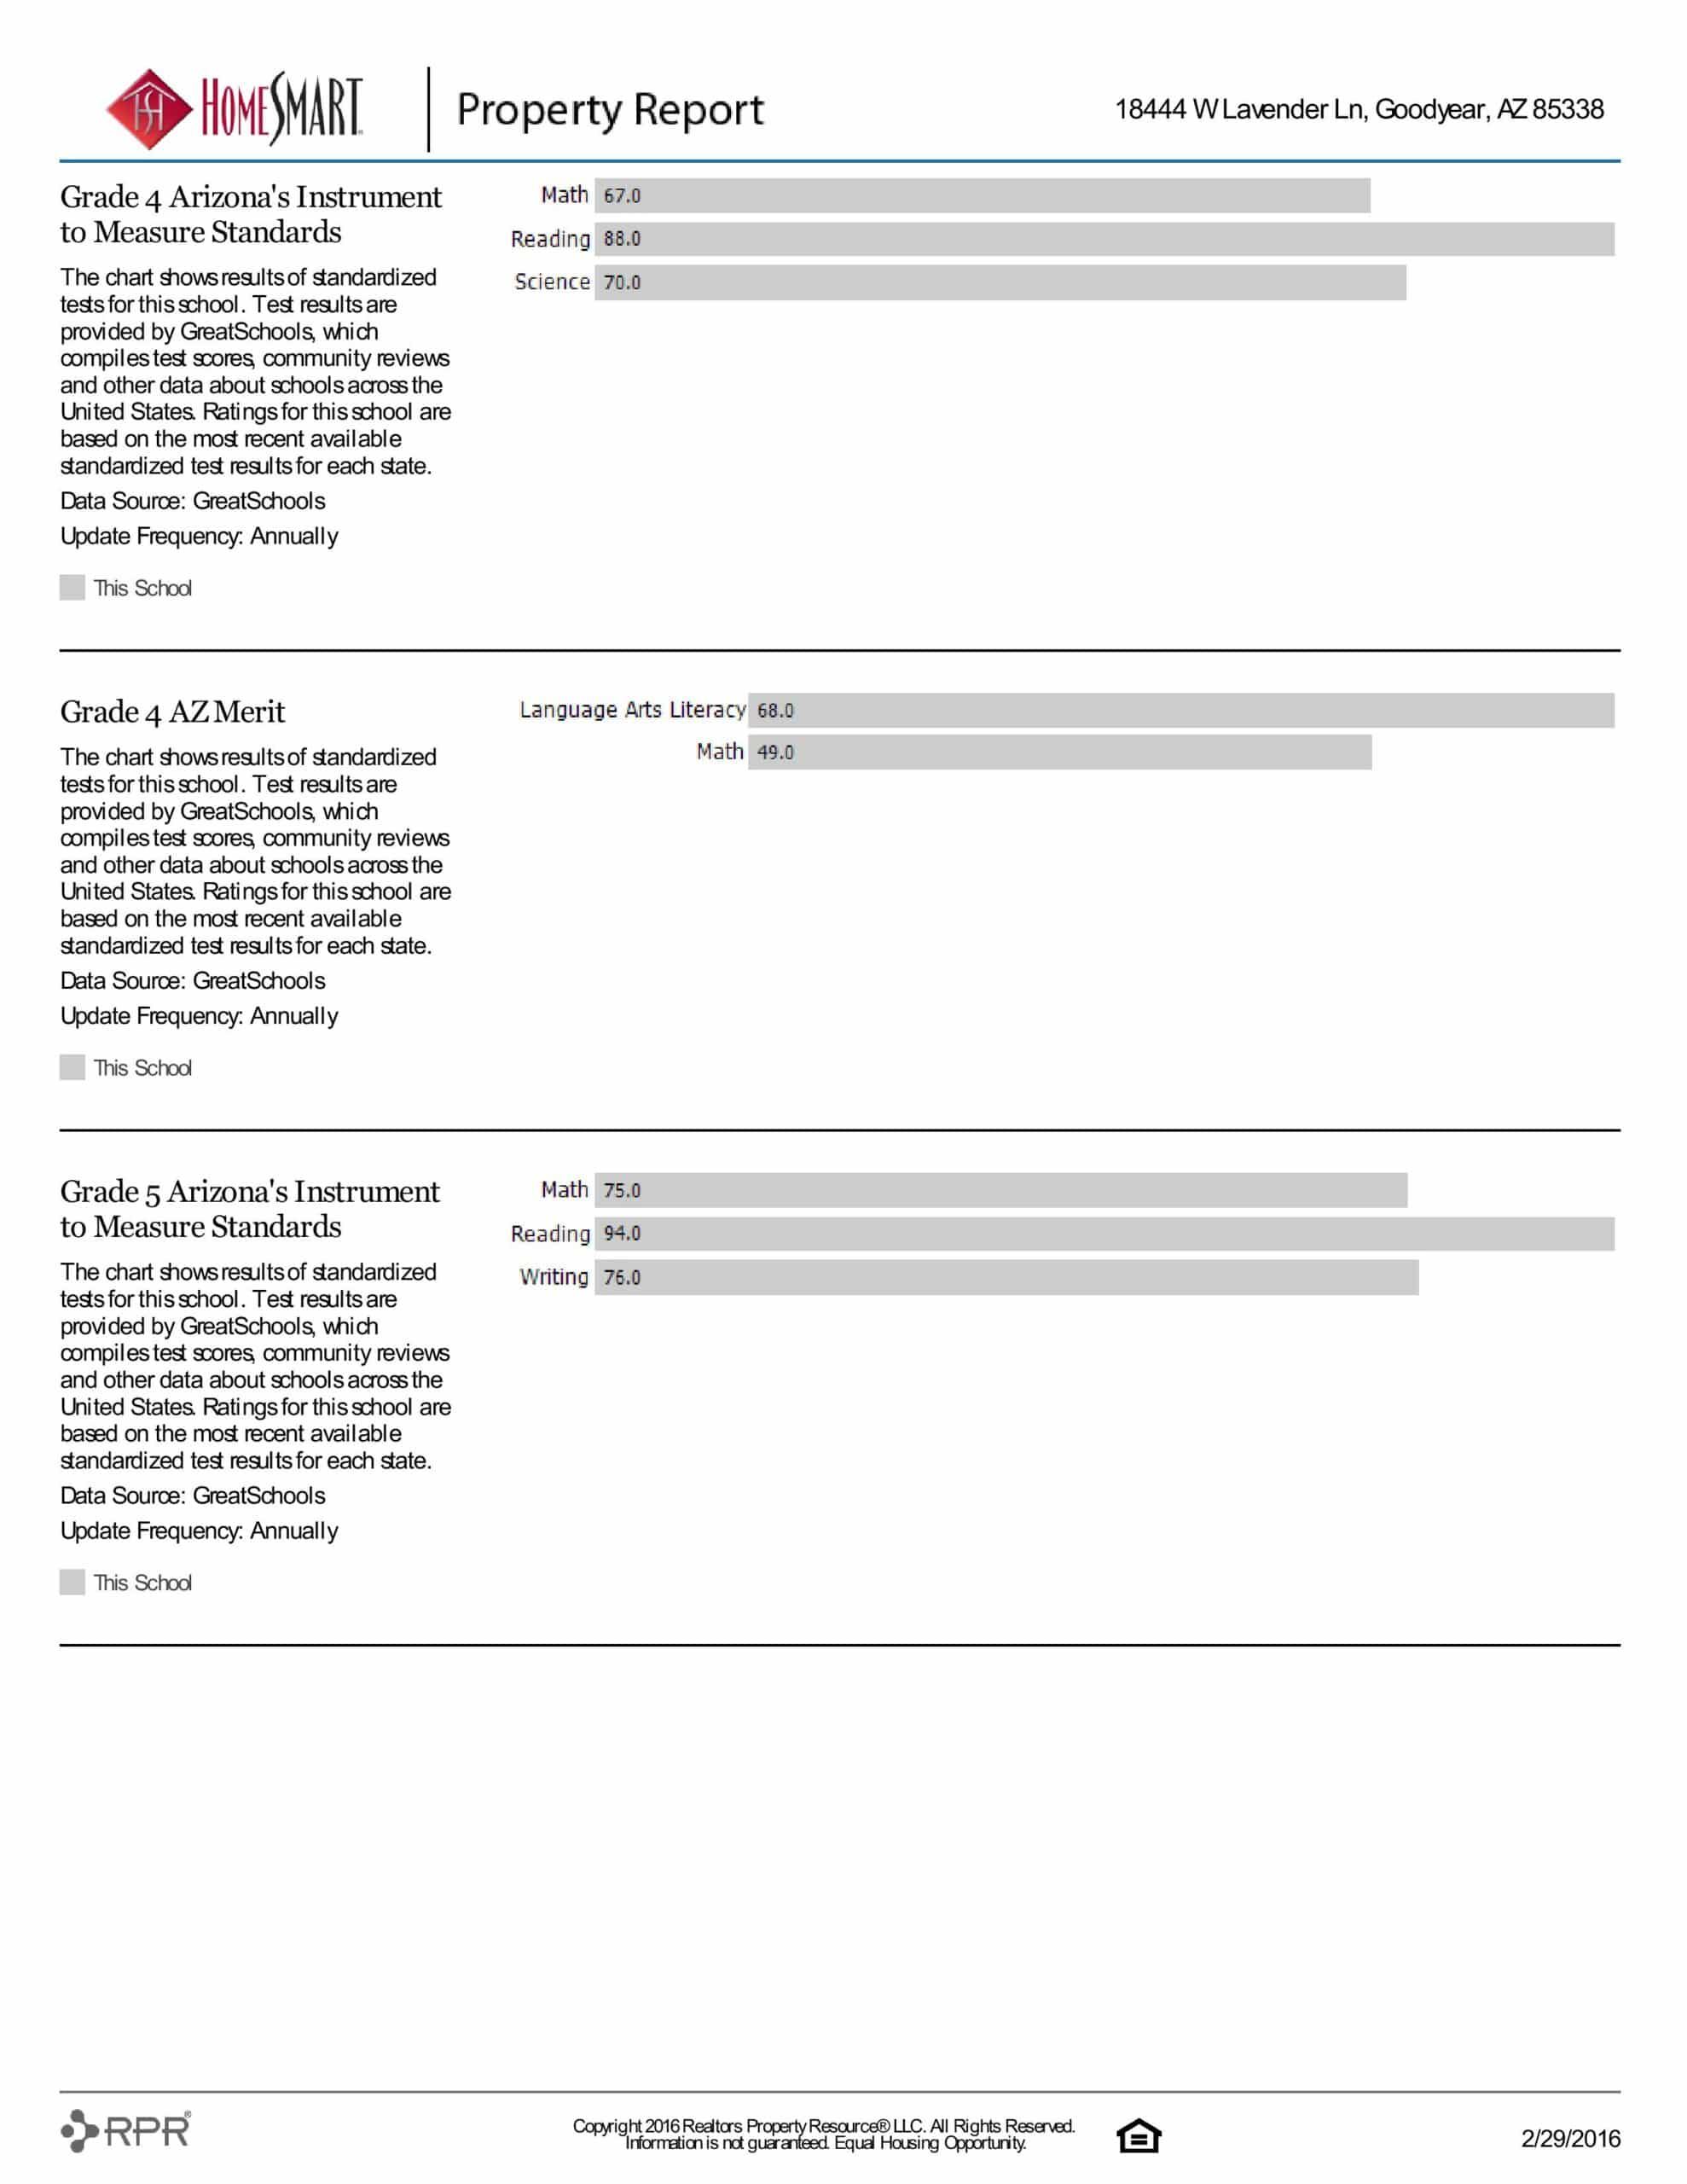 18444 W LAVENDER LN PROPERTY REPORT-page-040